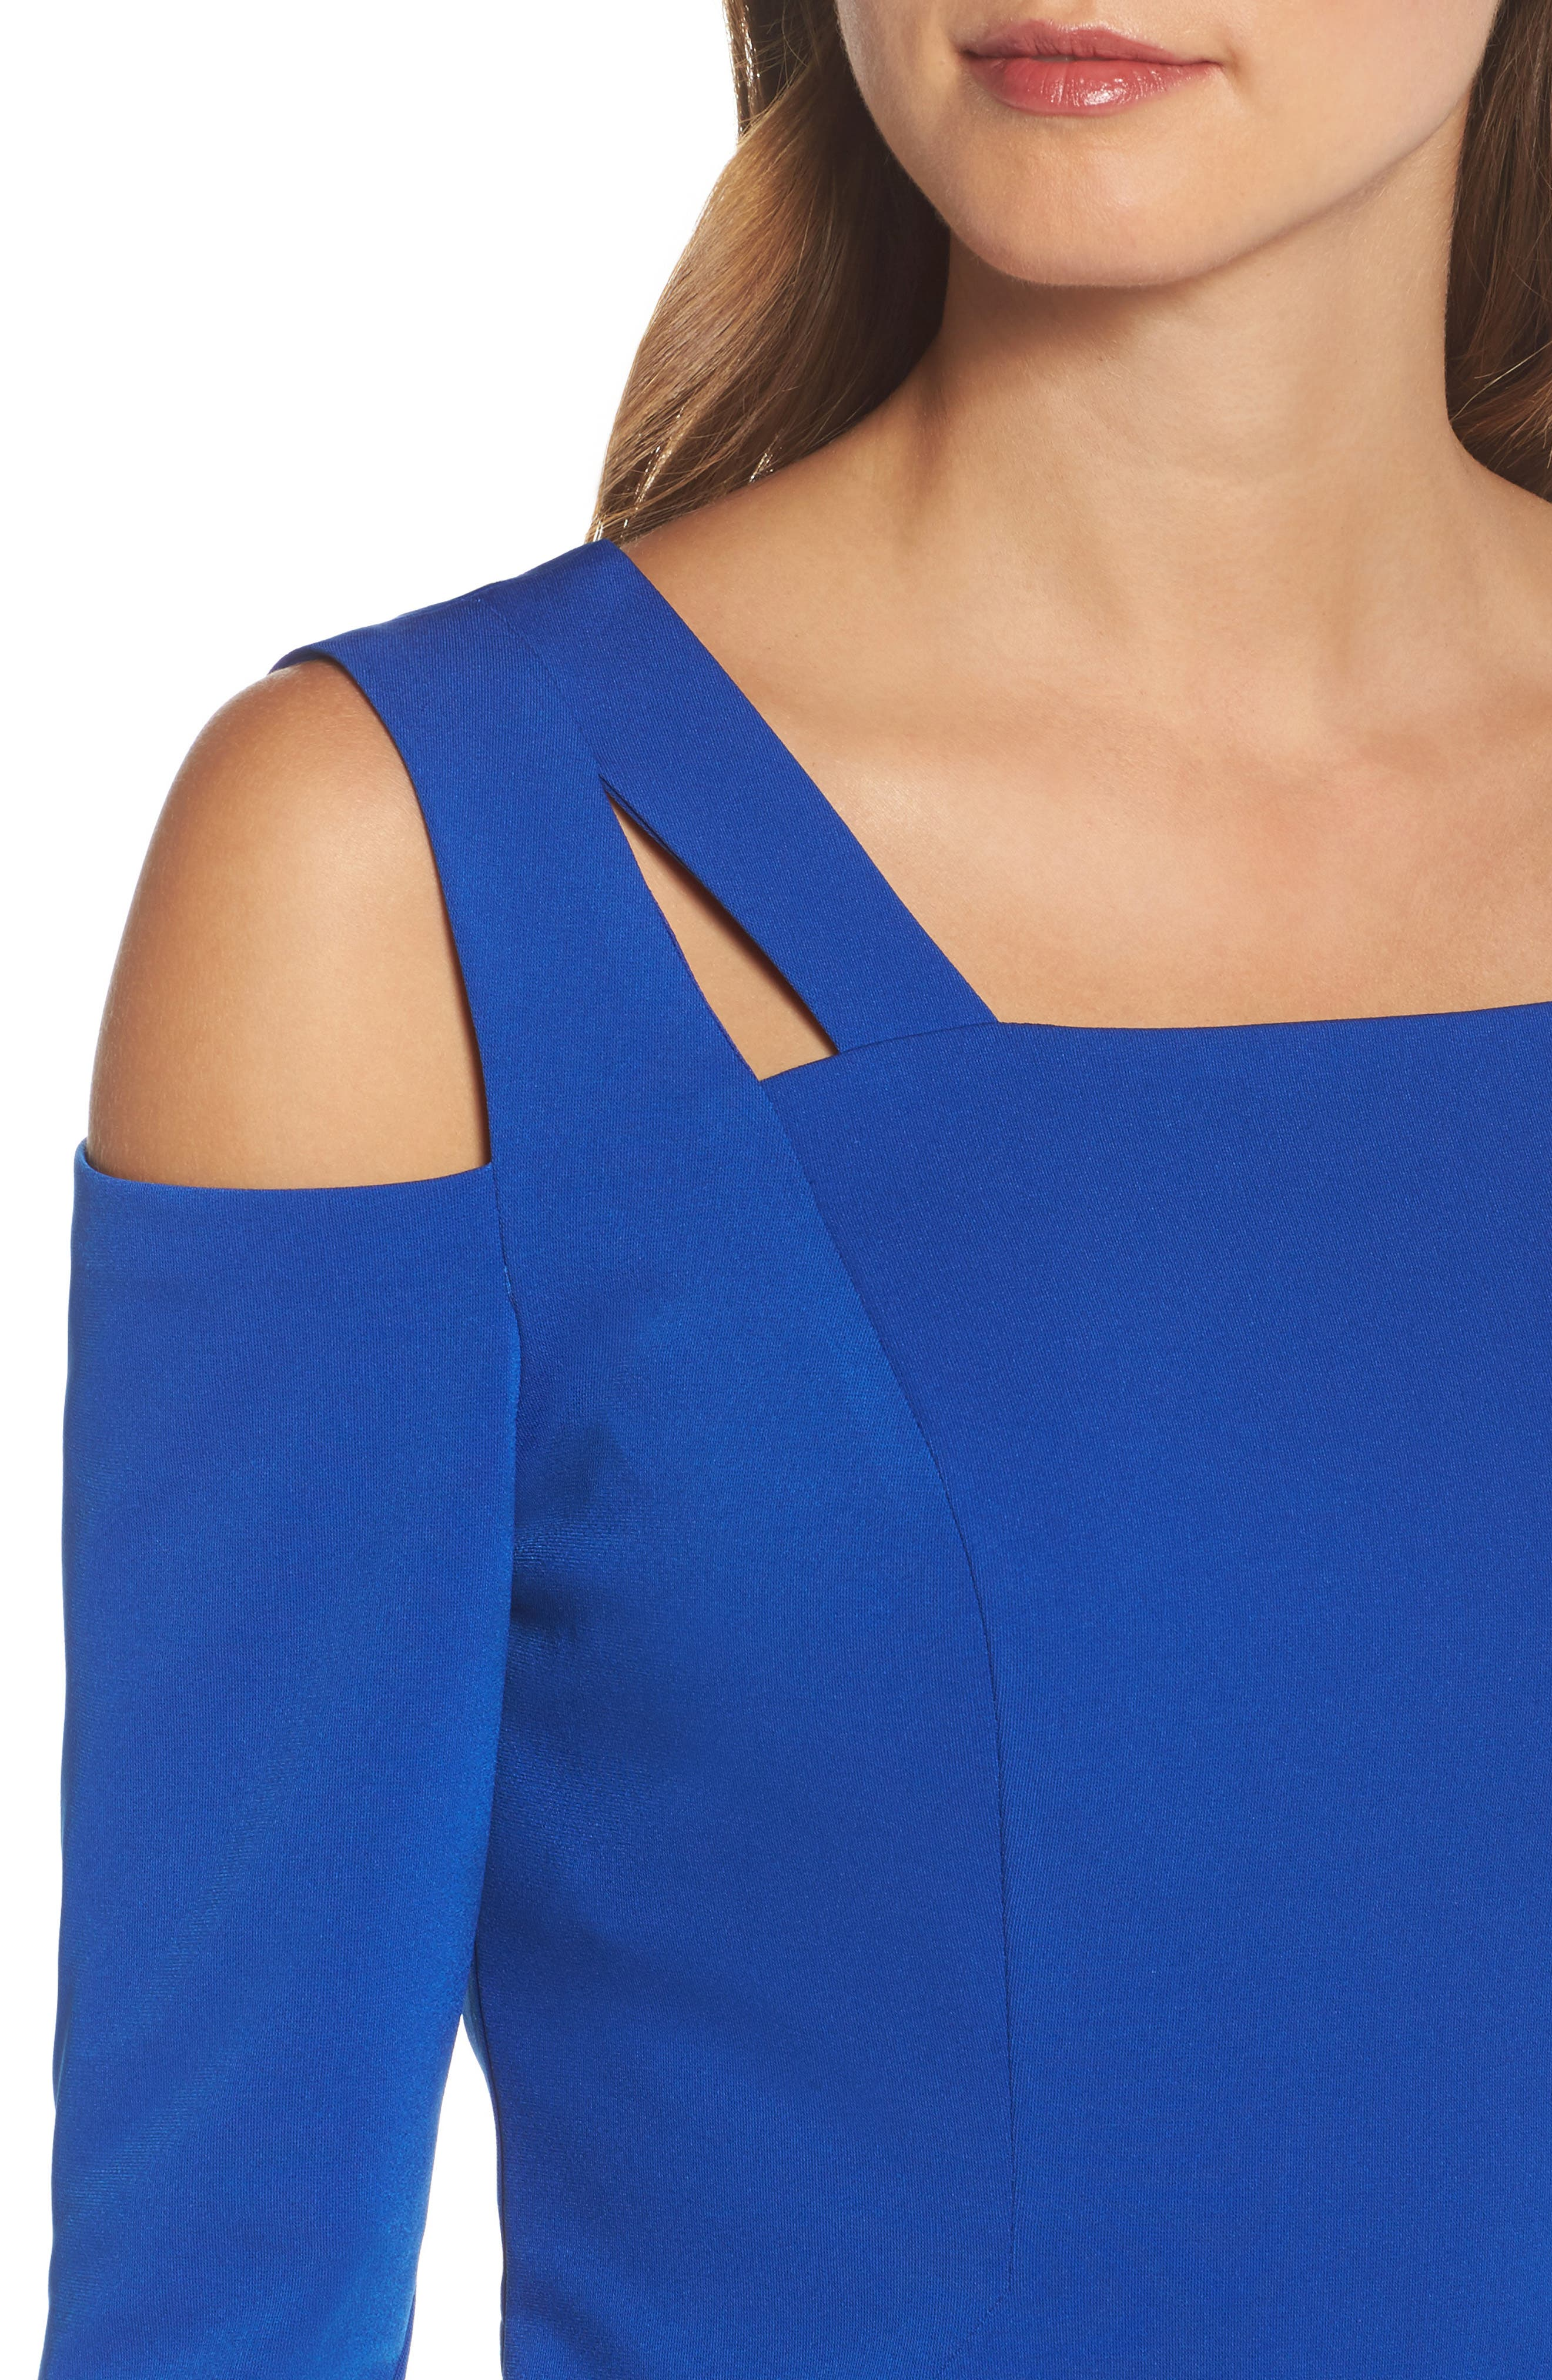 Cold Shoulder Sheath Dress,                             Alternate thumbnail 4, color,                             Cobalt